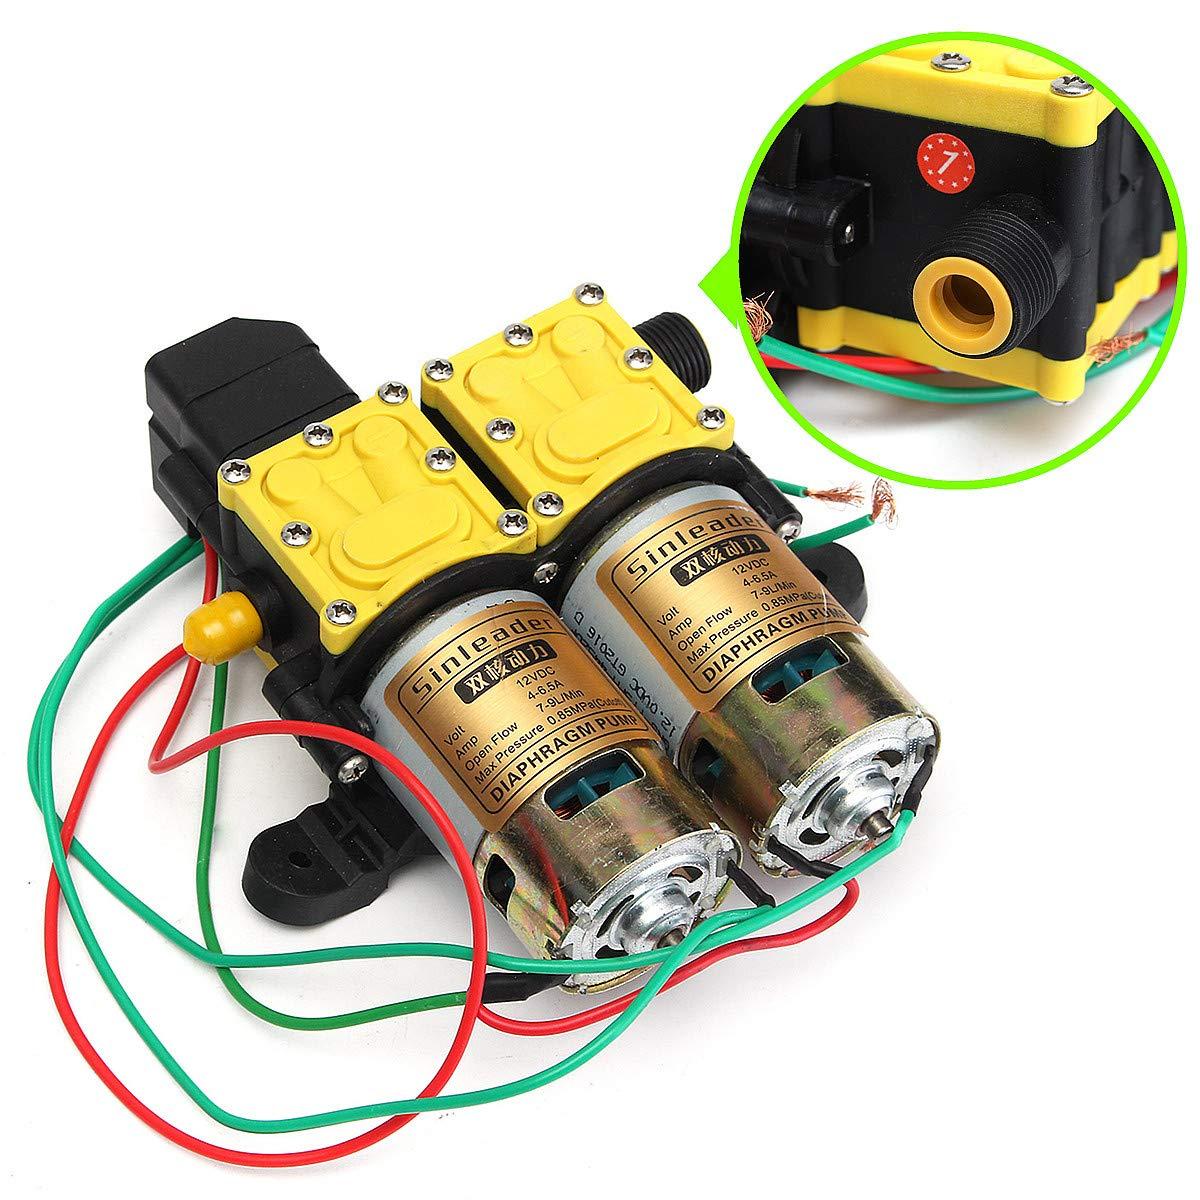 CCChaRLes 8Lpm Dc 12V Diafragma Bomba De Agua Lavadora Autopriming ...